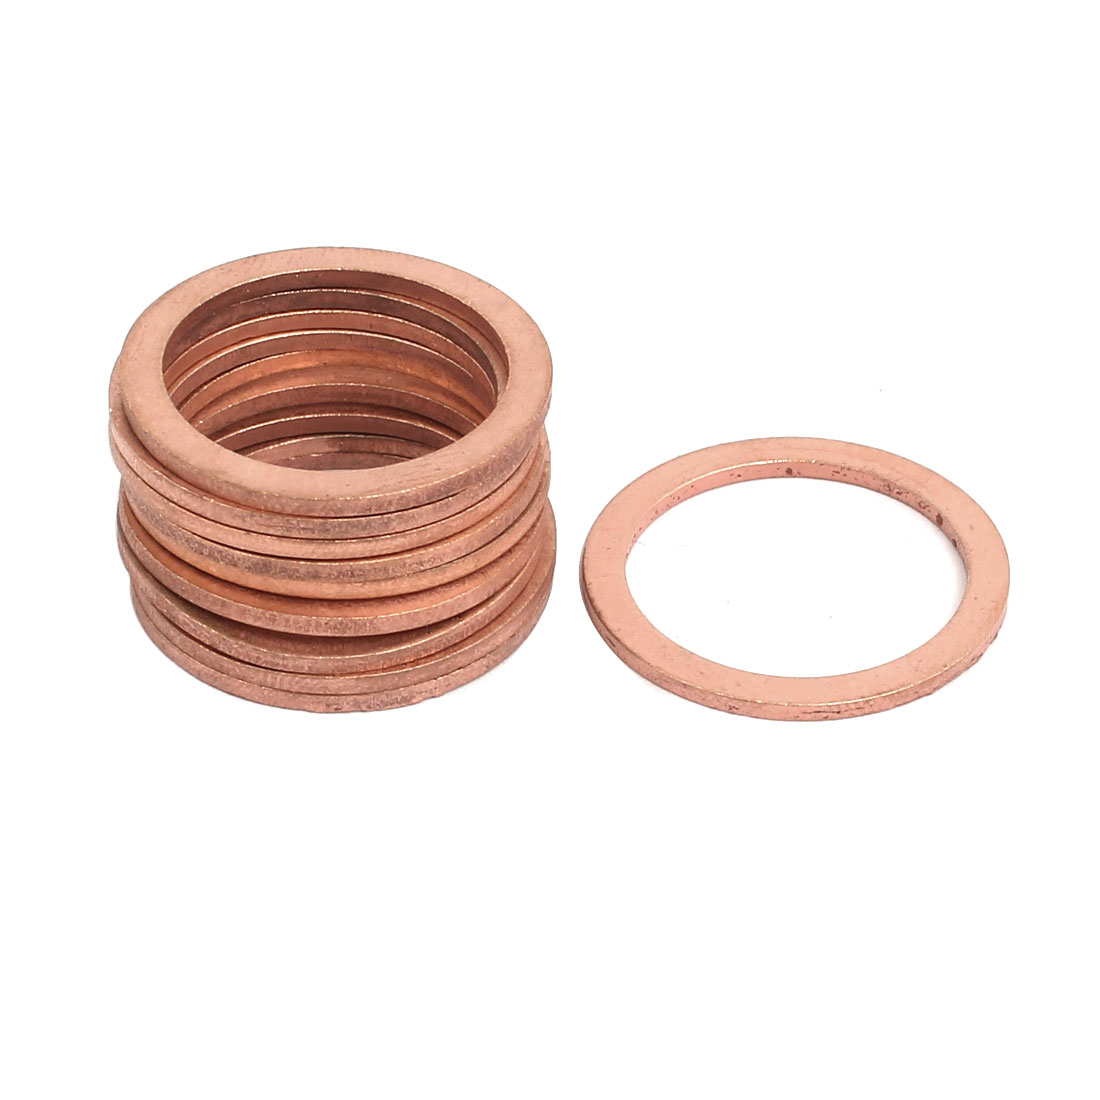 10pcs 22mmx28mmx1.5mm Copper Flat Ring Sealing Crush Washer Gasket